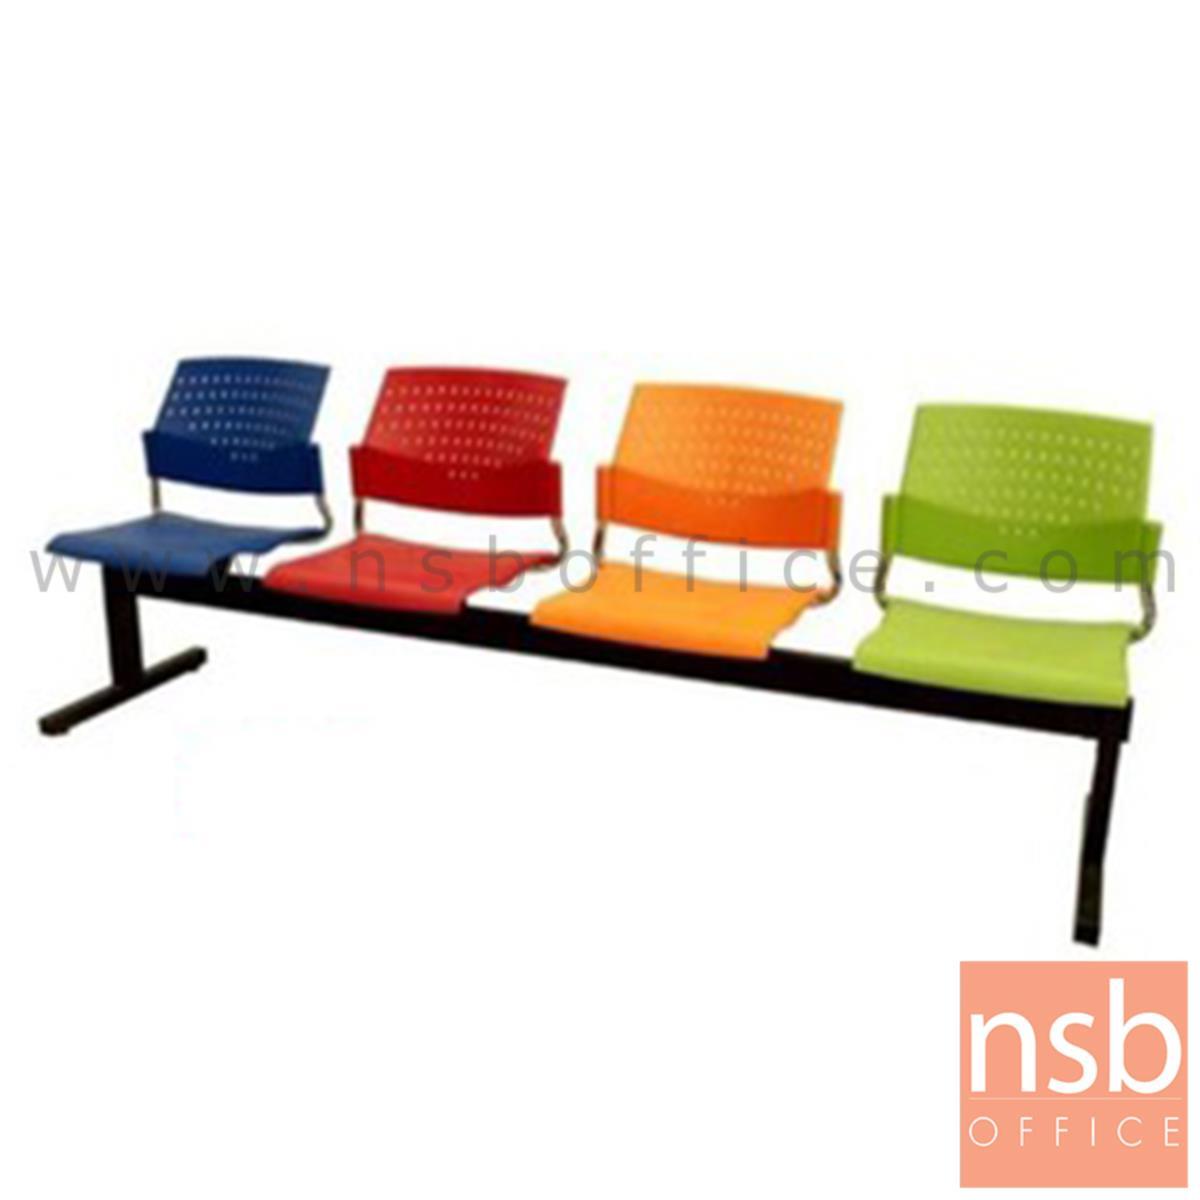 B06A080:เก้าอี้นั่งคอยเฟรมโพลี่ รุ่น TDG-234 2 ,3 ,4 ที่นั่ง ขนาด 99W ,156W ,207W cm. ขาเหล็ก